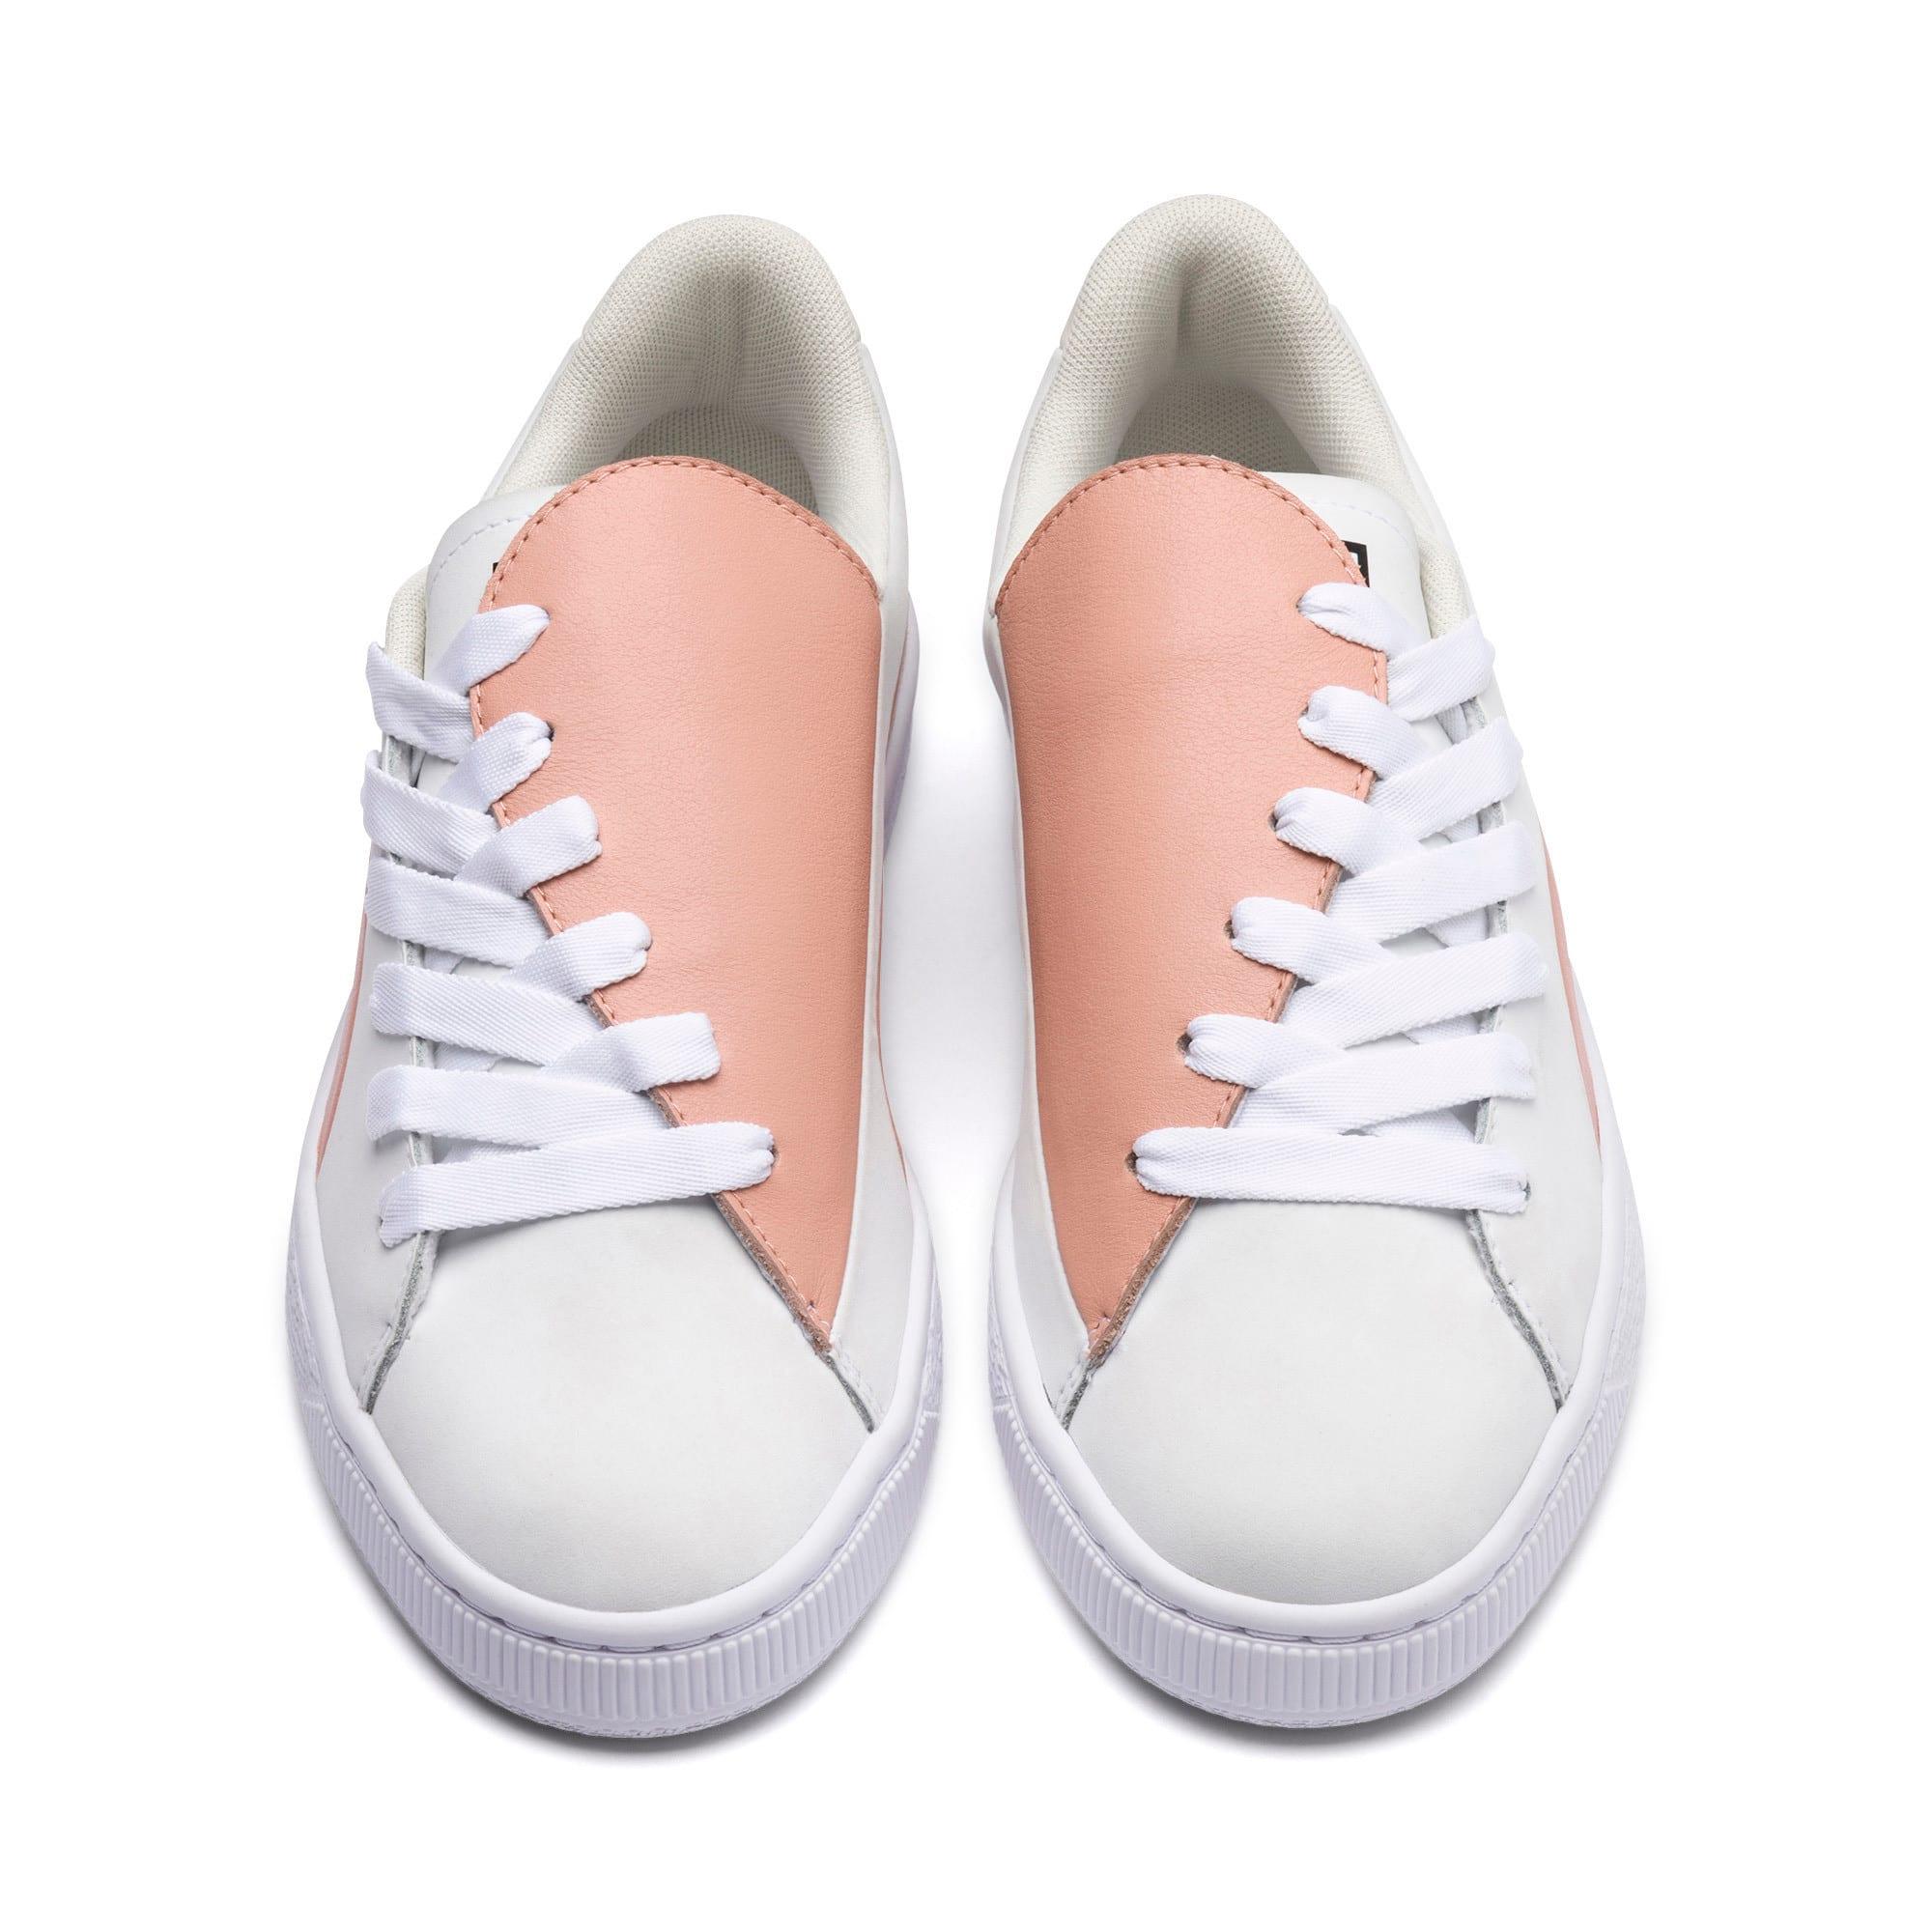 Thumbnail 2 of Basket Crush Paris Women's Sneakers, Peach Beige-Puma White, medium